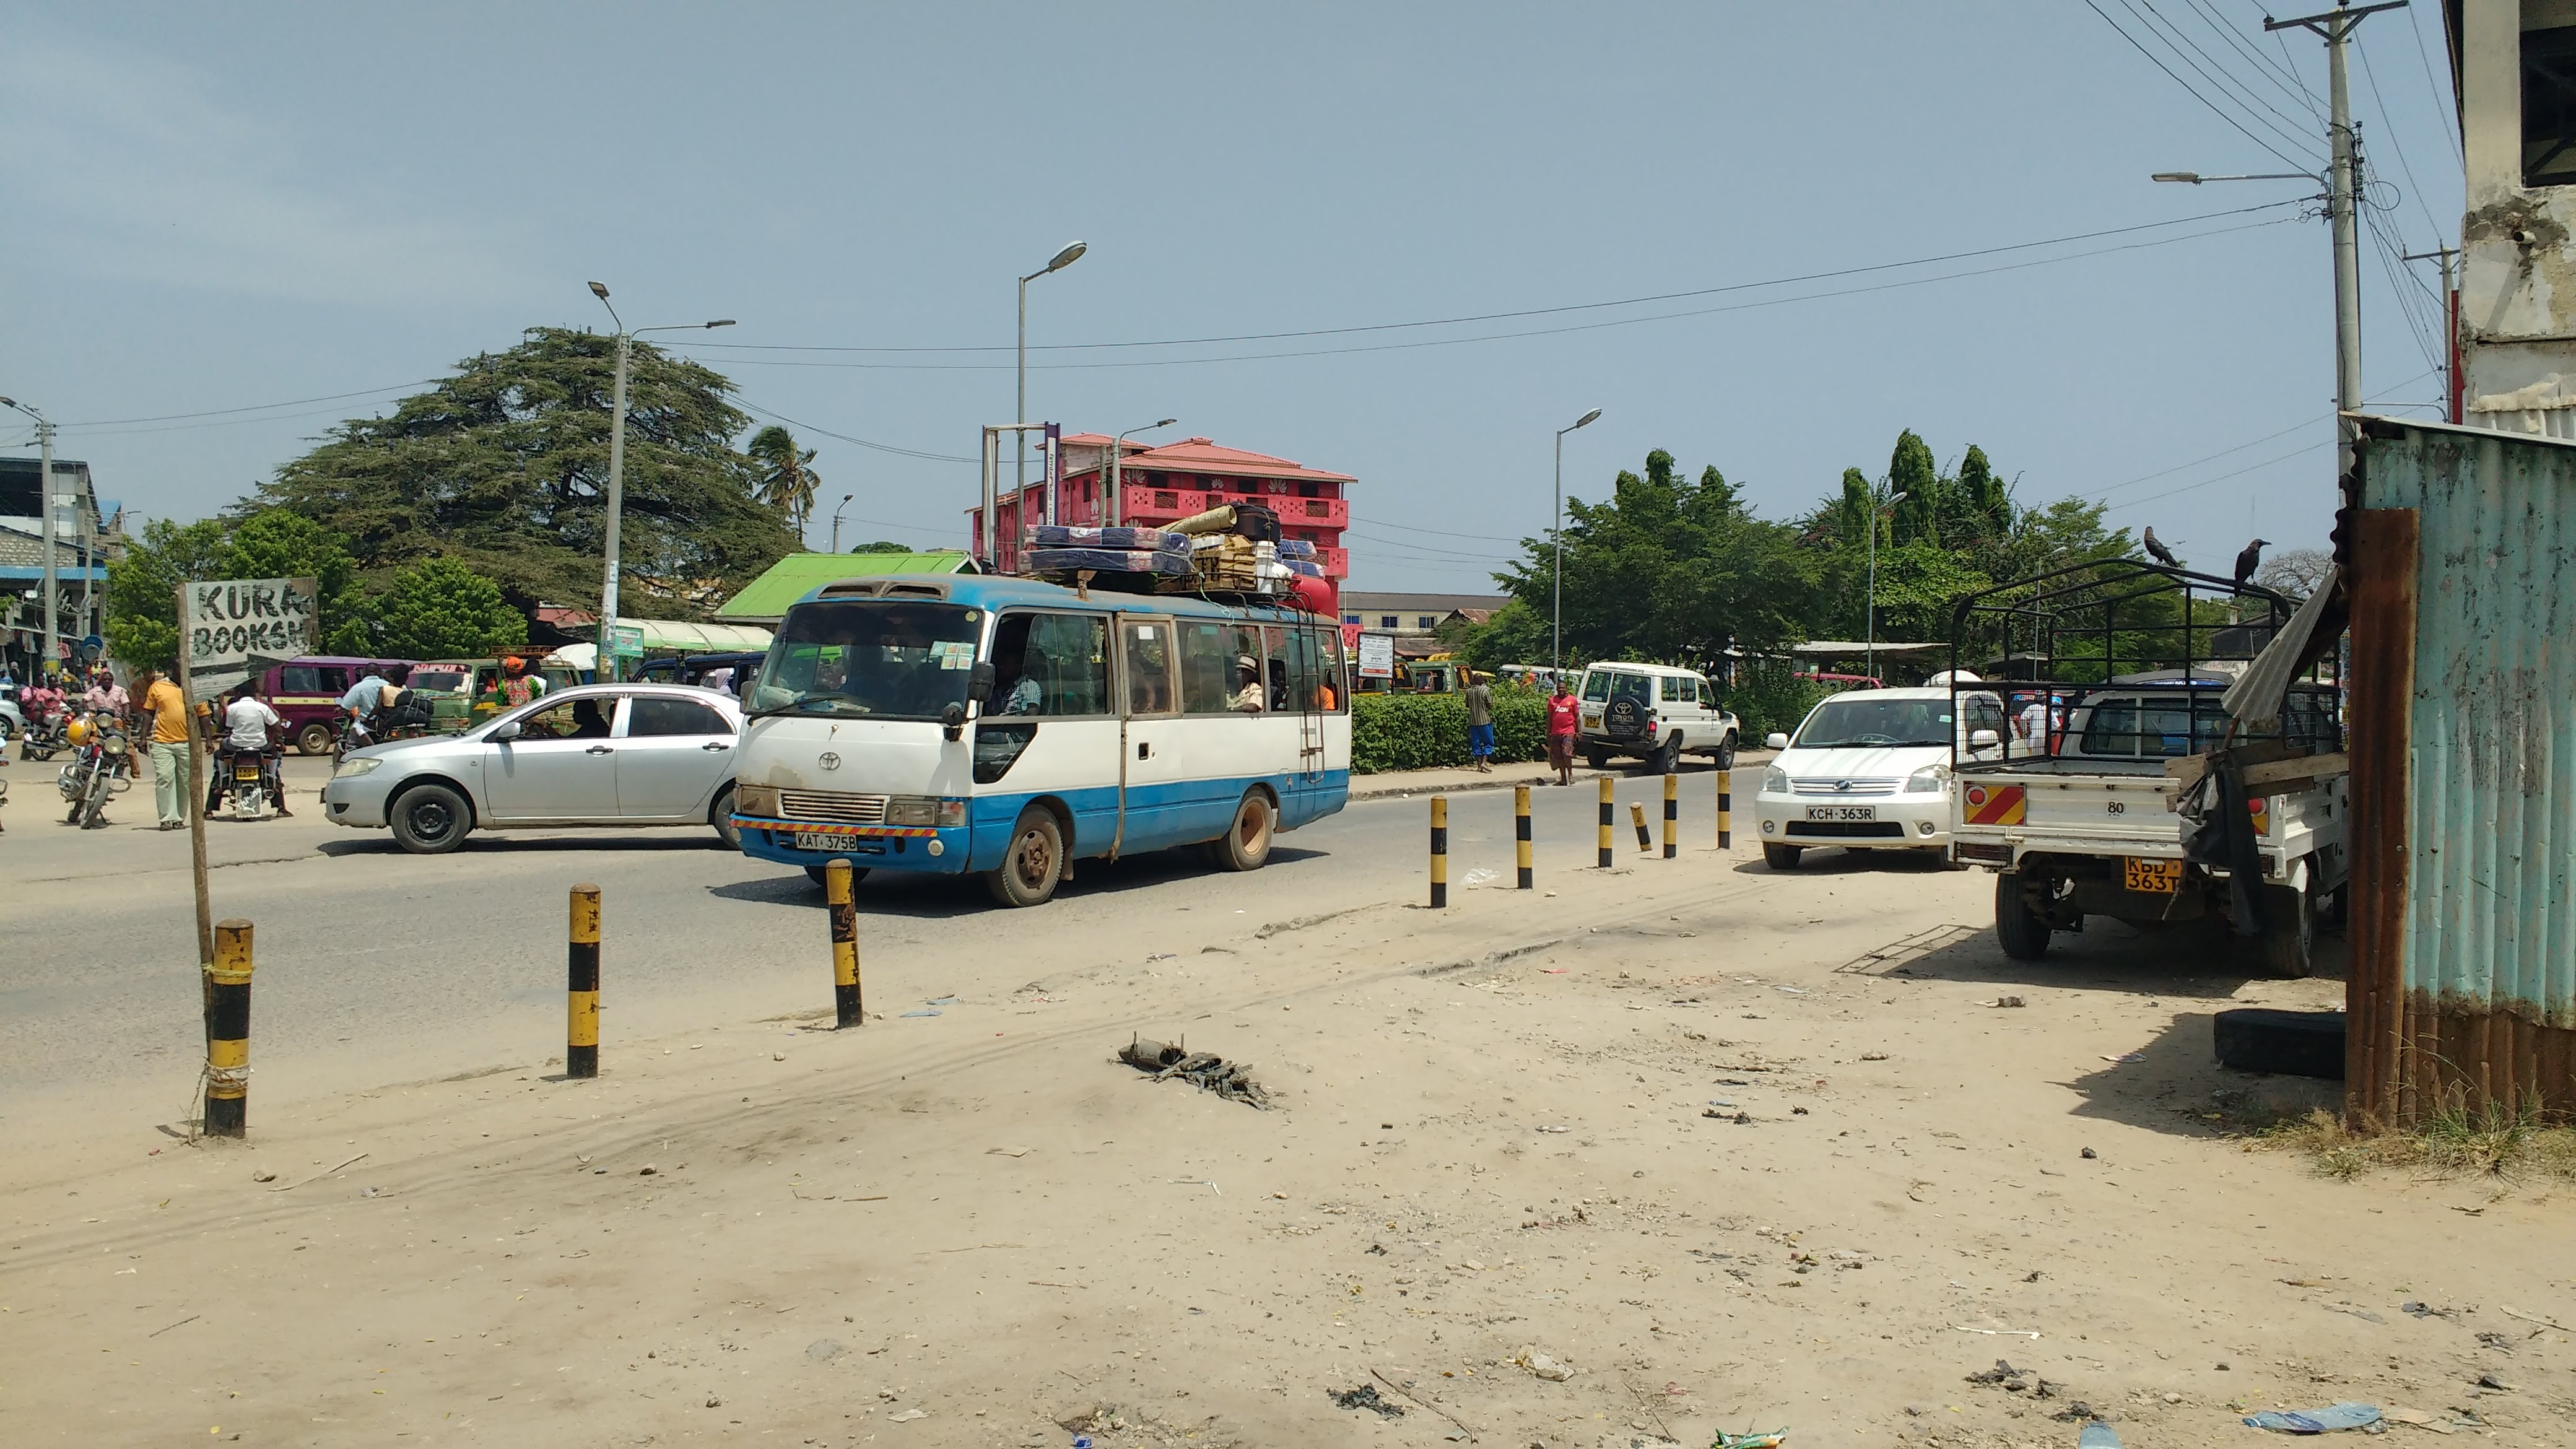 Mombasa frauen kennenlernen